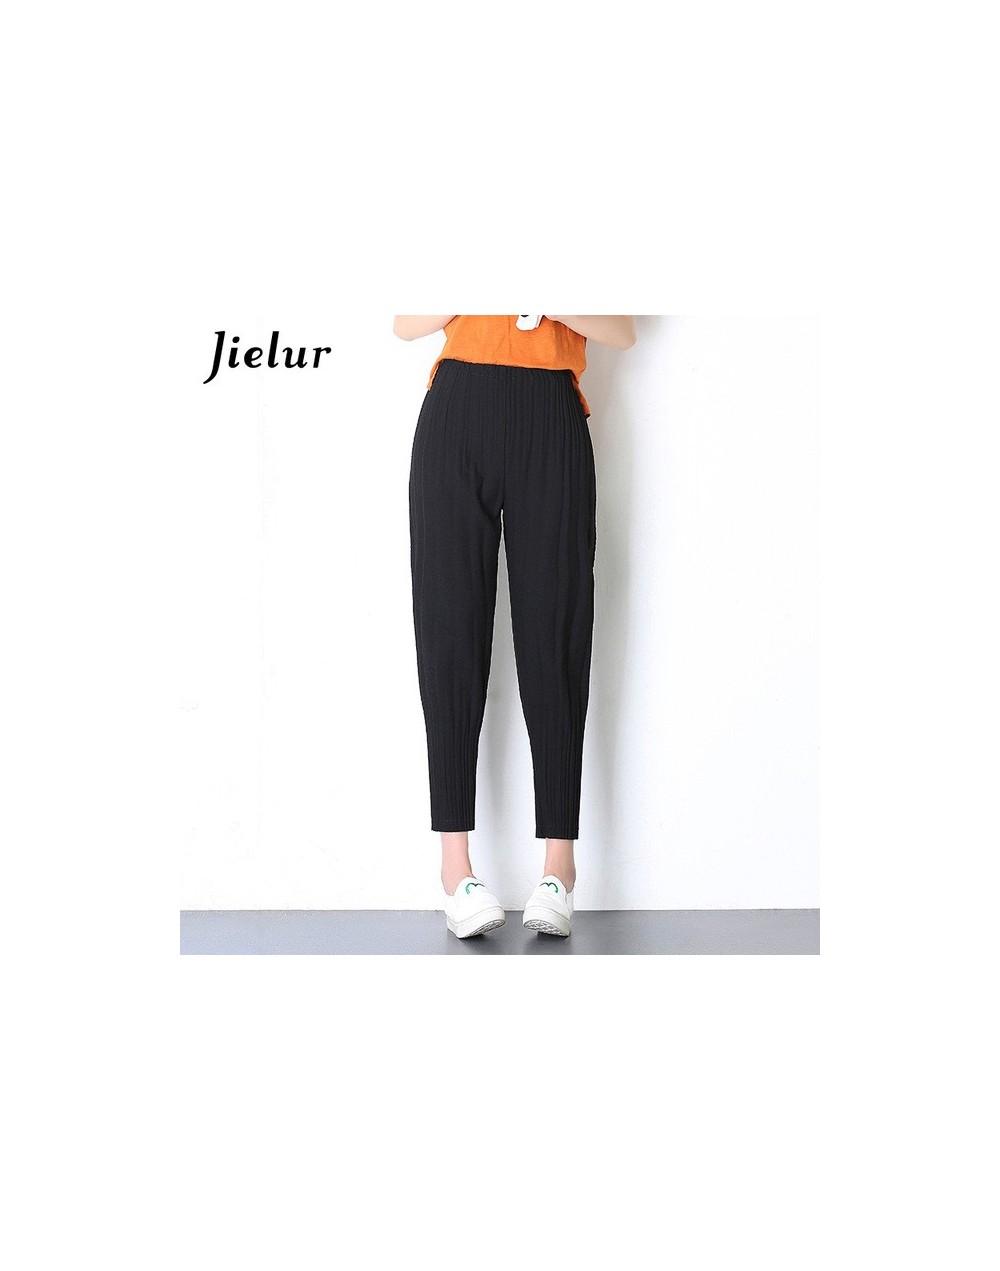 Autumn New Chiffon Harajuku Casual Women Pants Pleated Harem Pant Elastic High Waist Streetwear Trousers Lantern Trousers - ...